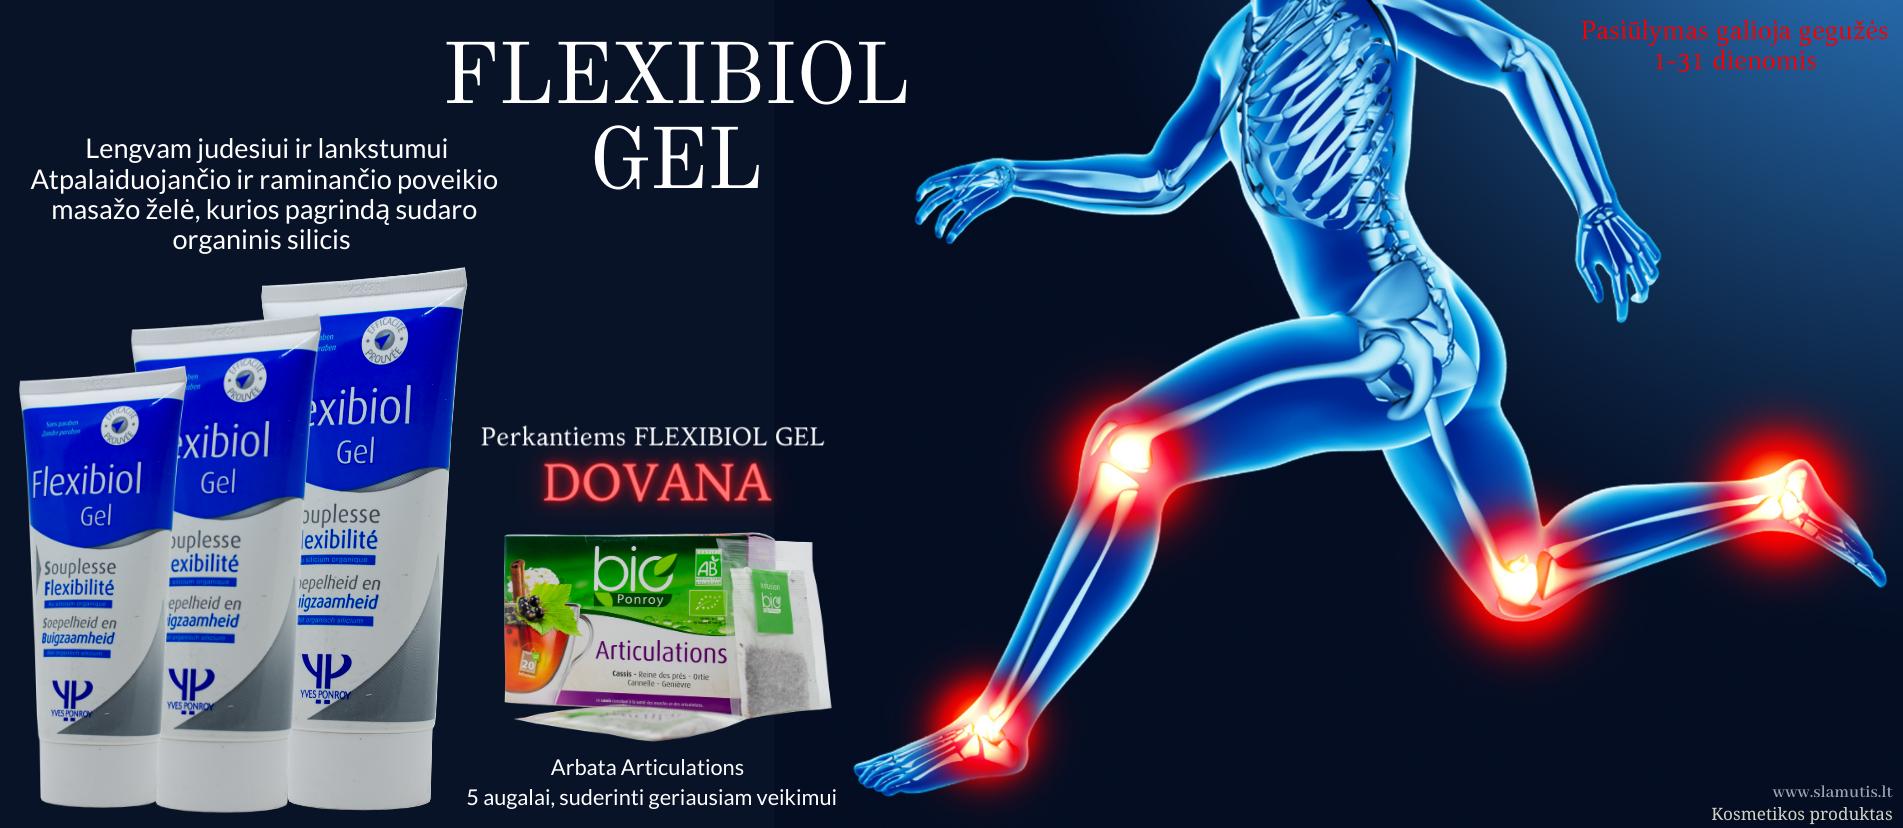 Flexibiol-sanariams_slamutis.lt